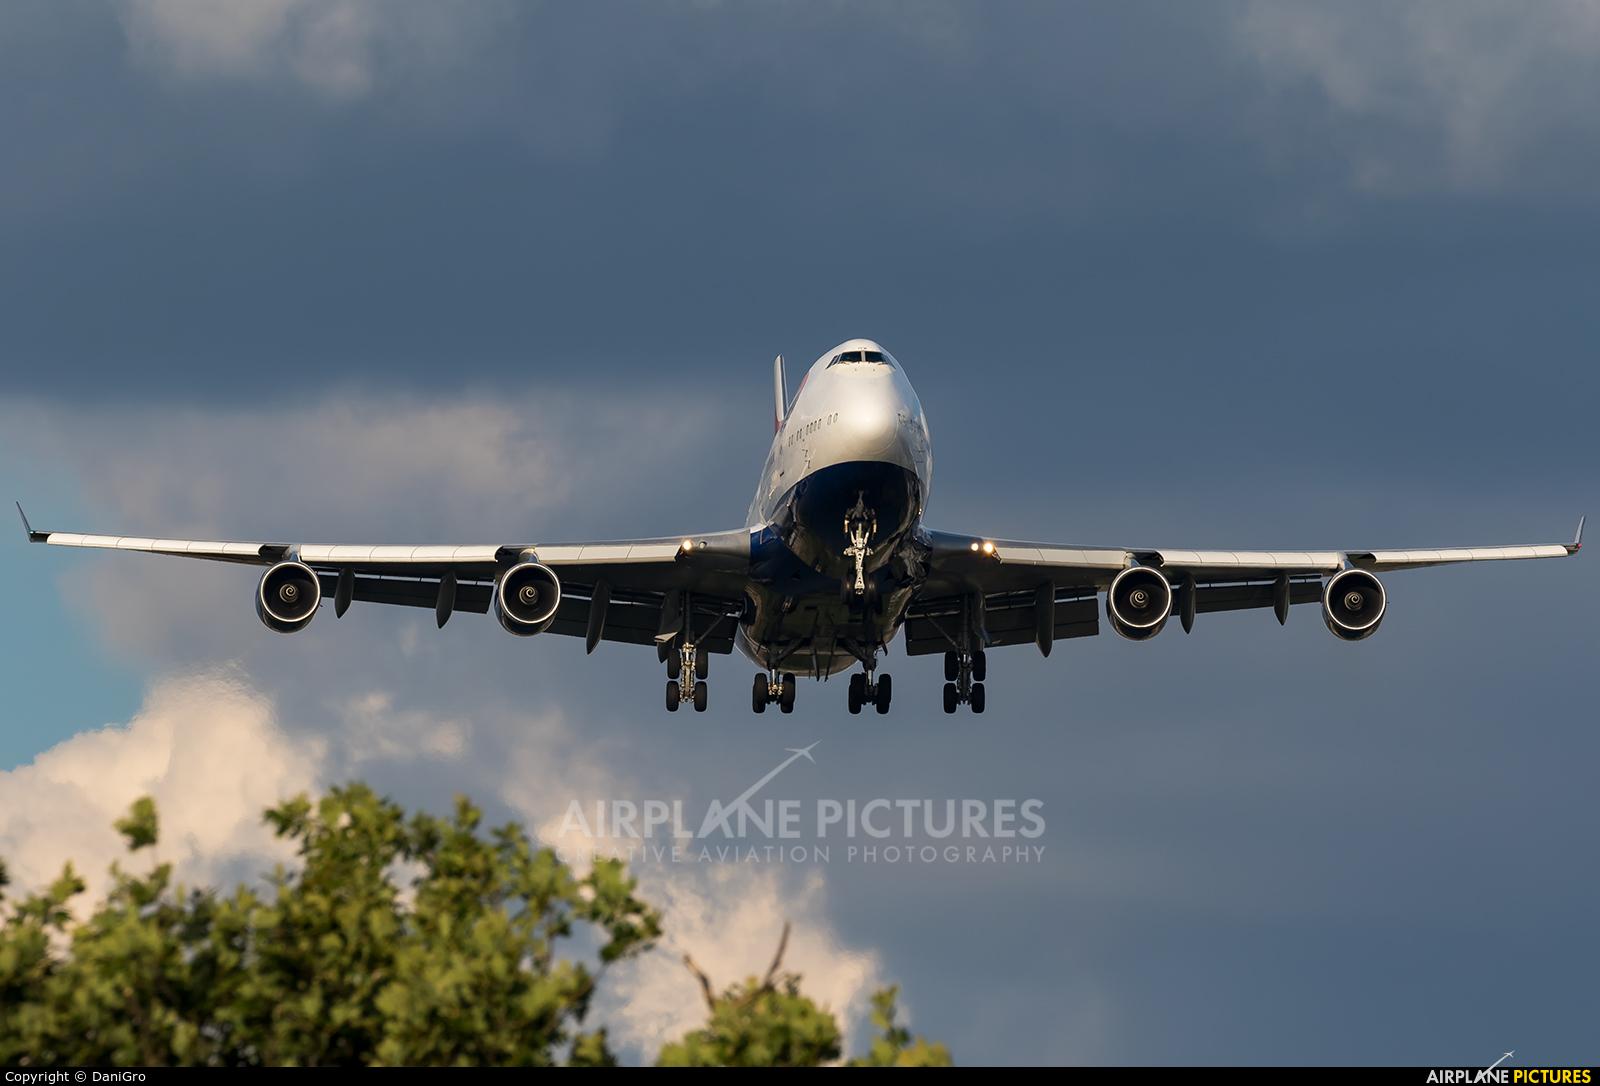 British Airways G-CIVW aircraft at London - Heathrow